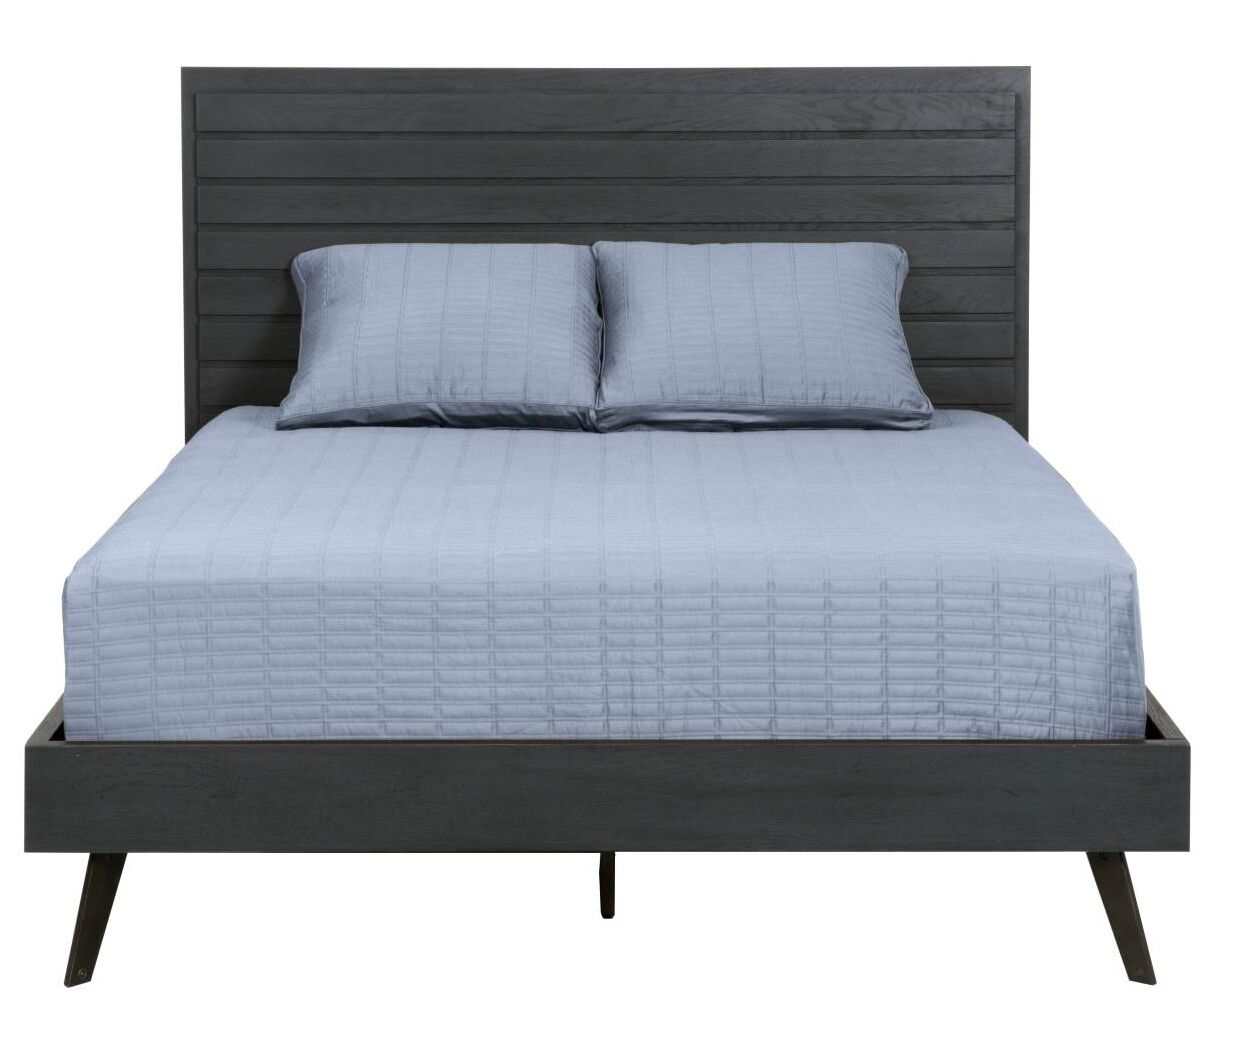 Mahore Standard Platform Bed Size: California King